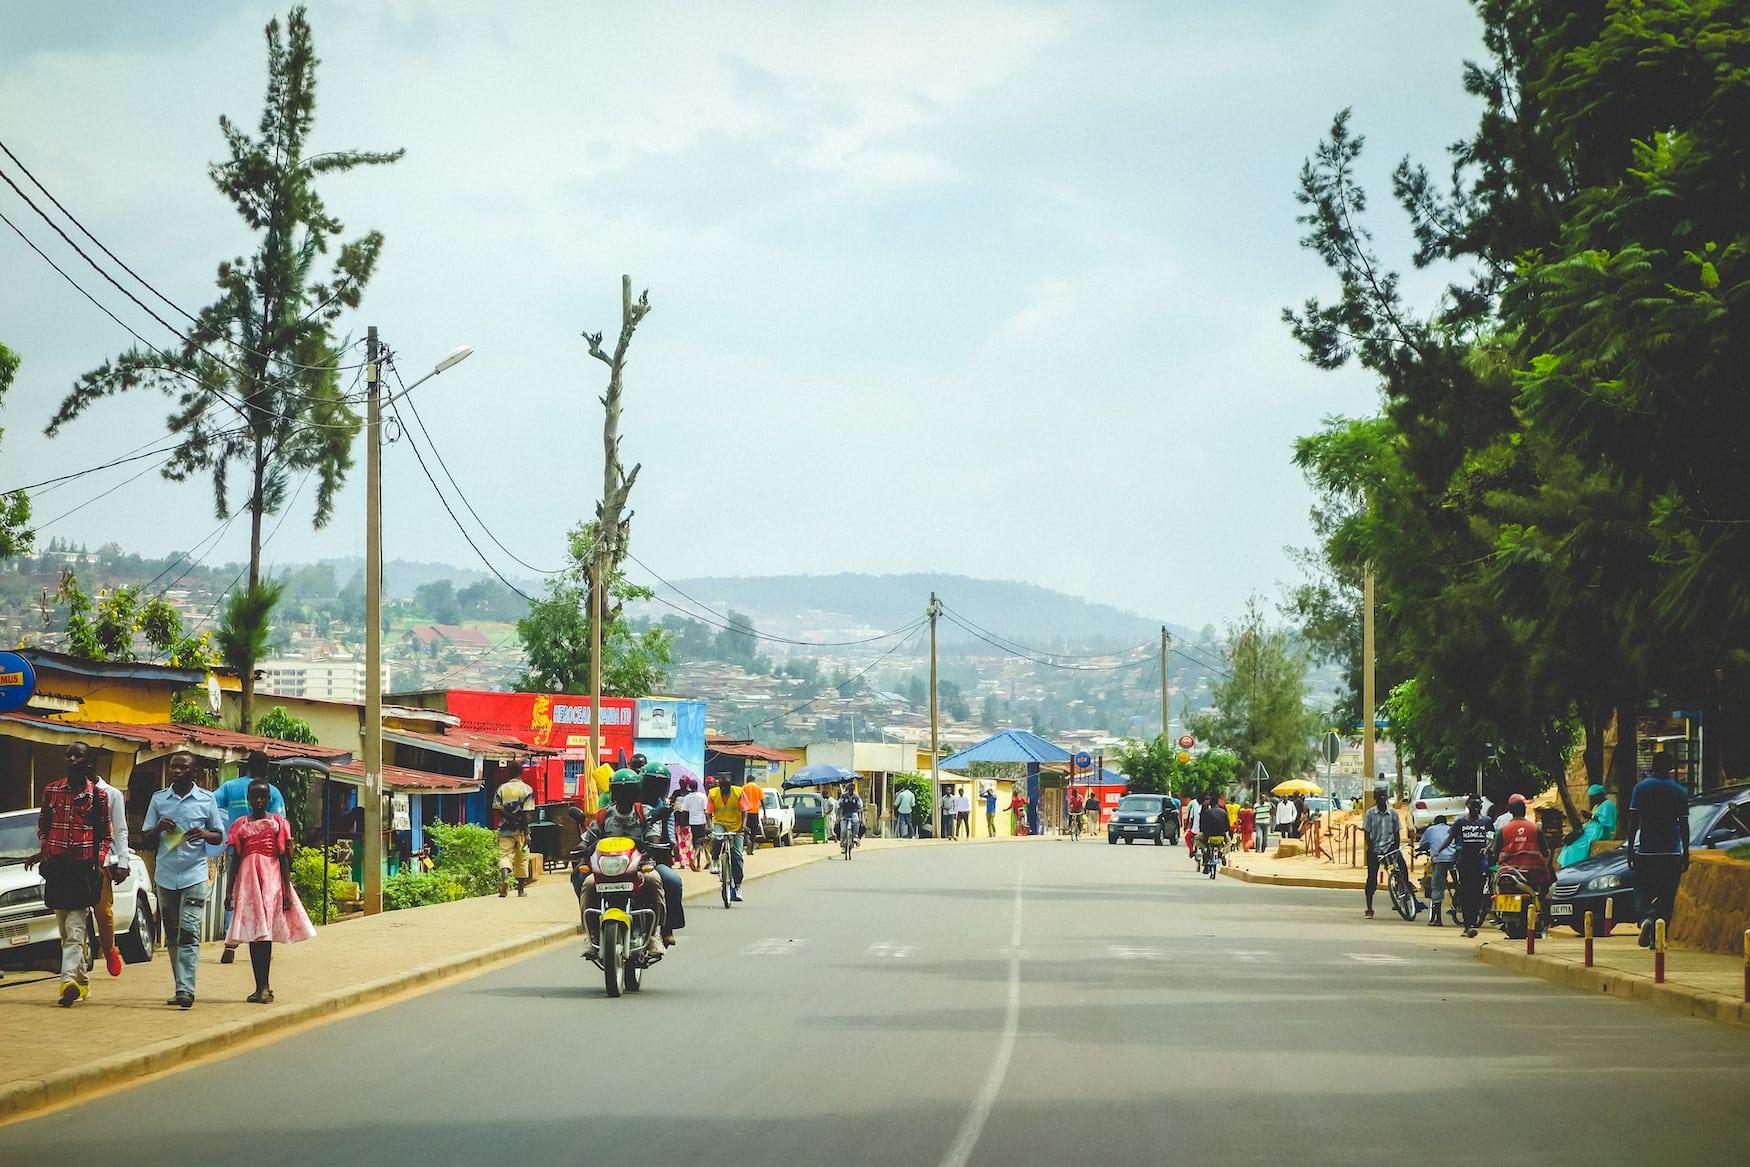 Öffentliche Straße in Ruanda